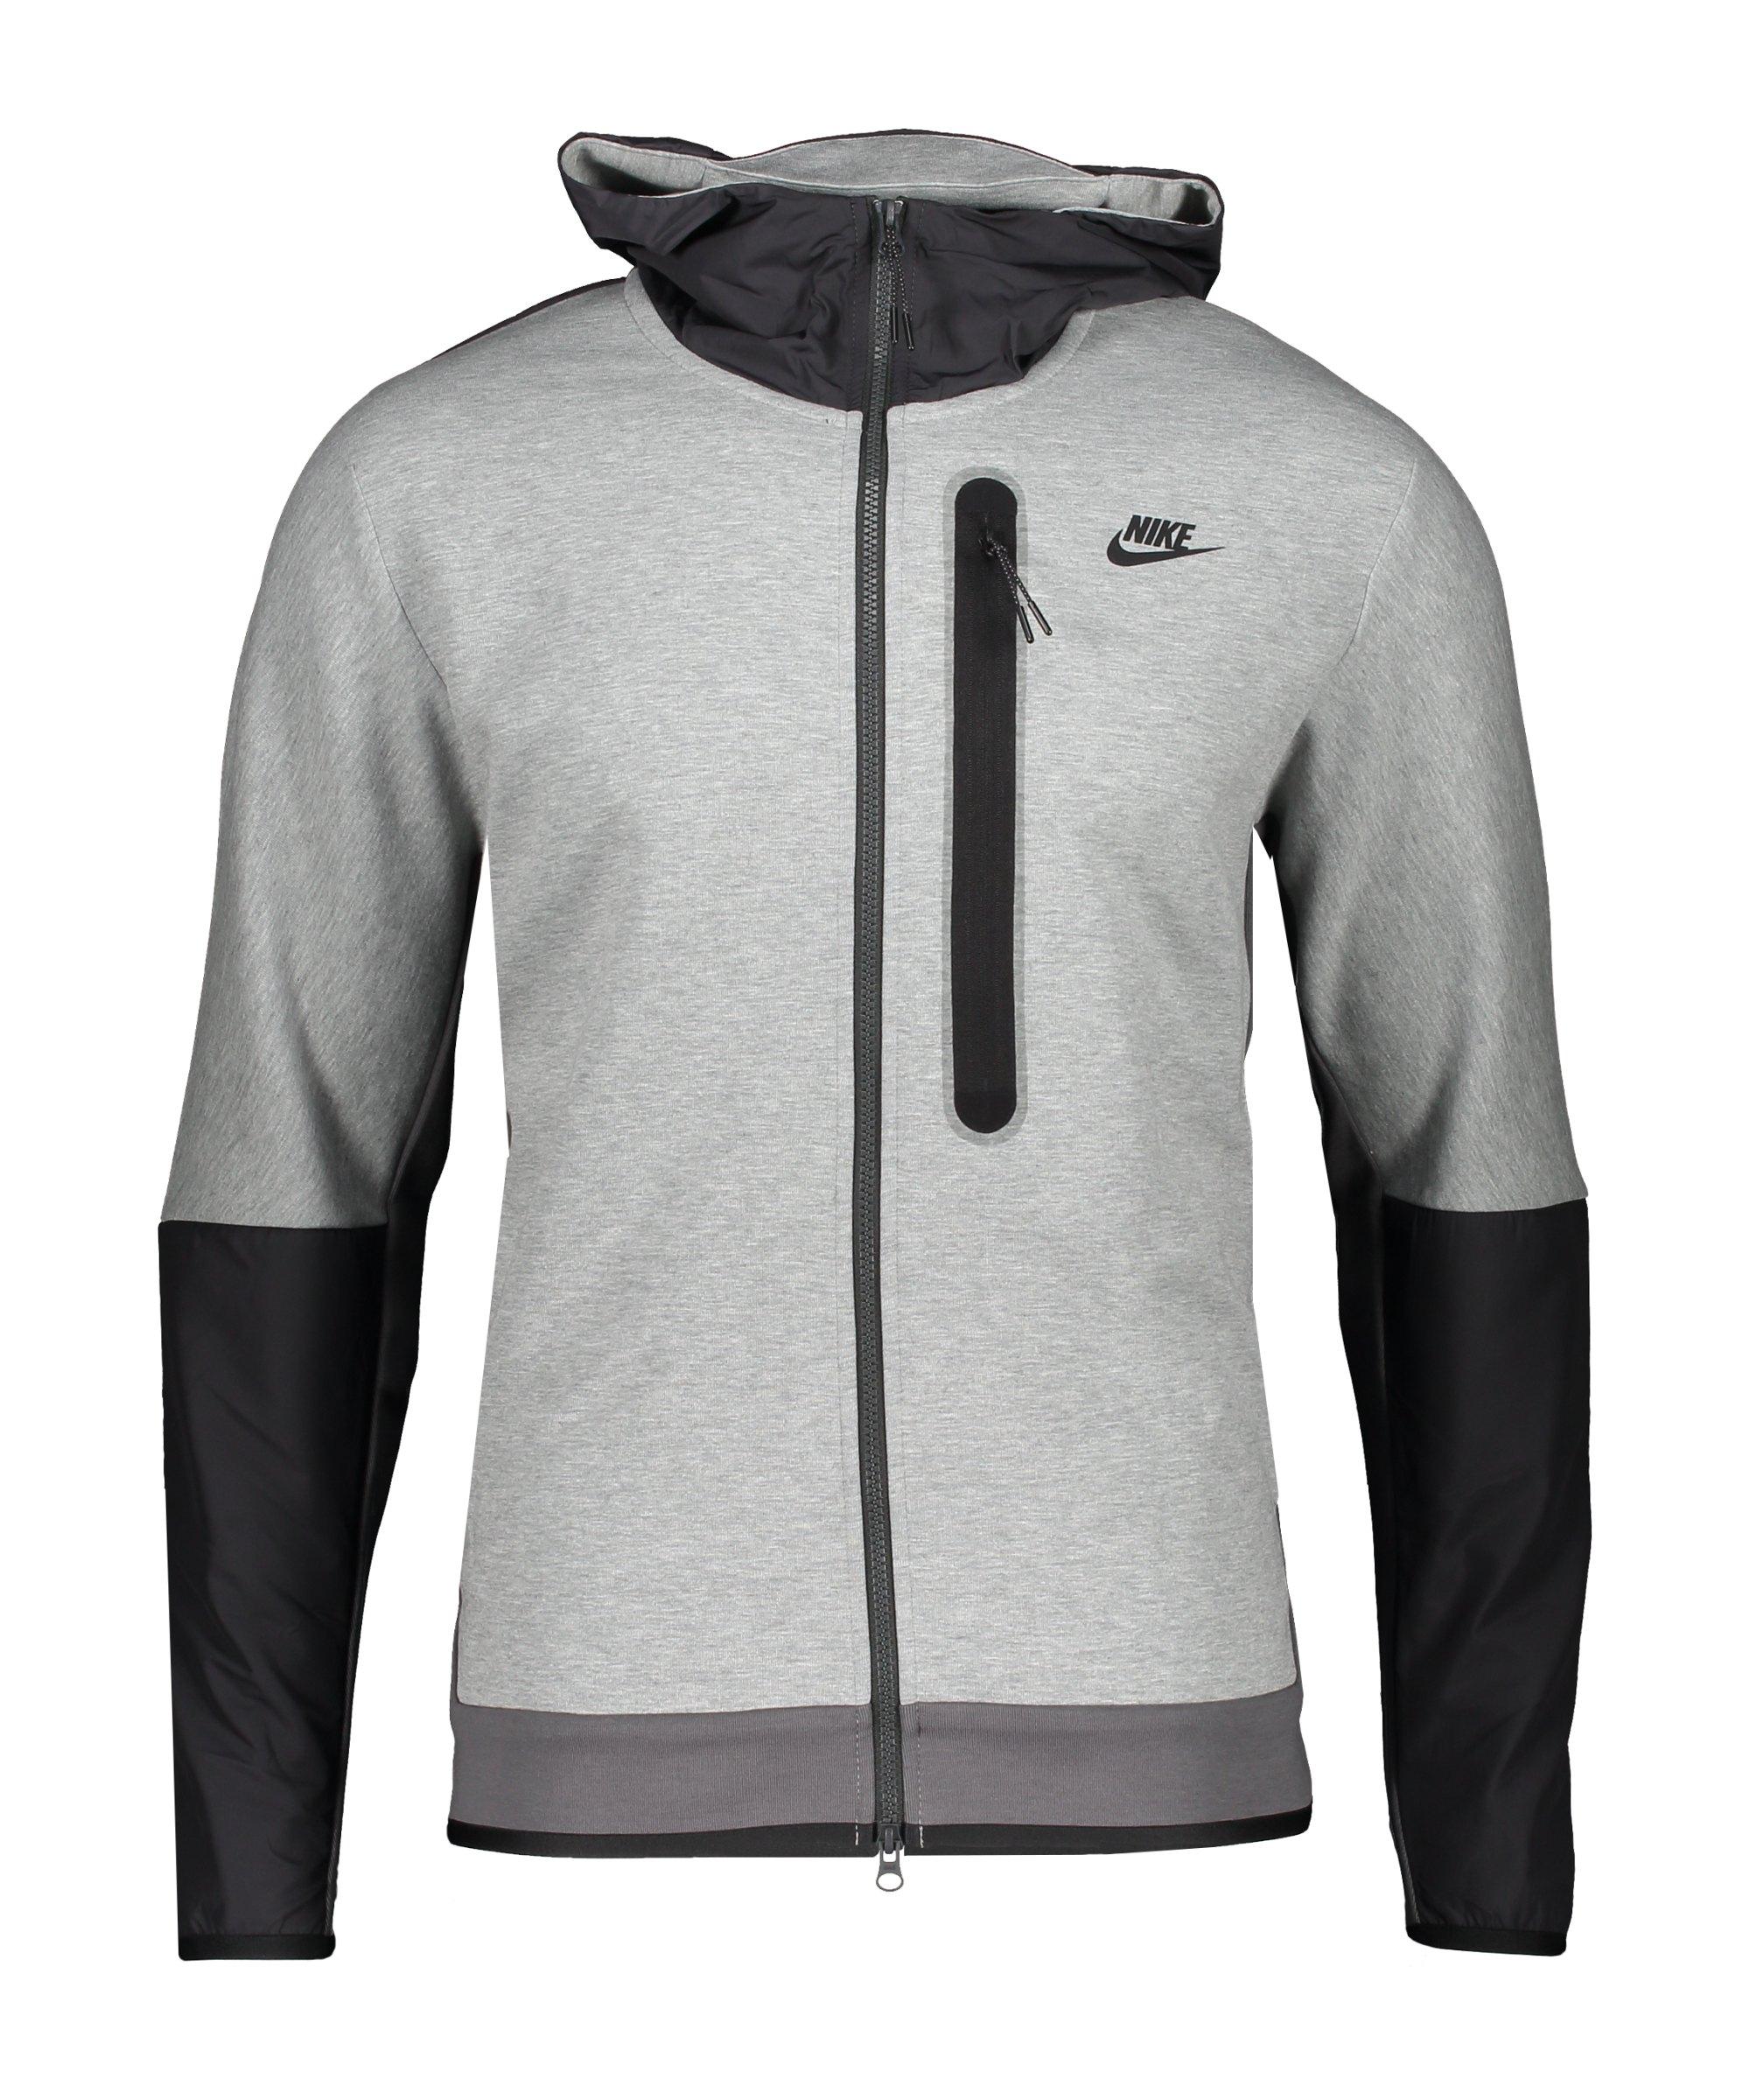 Nike Tech Fleece Kapuzenjacke Grau Schwarz F063 - grau